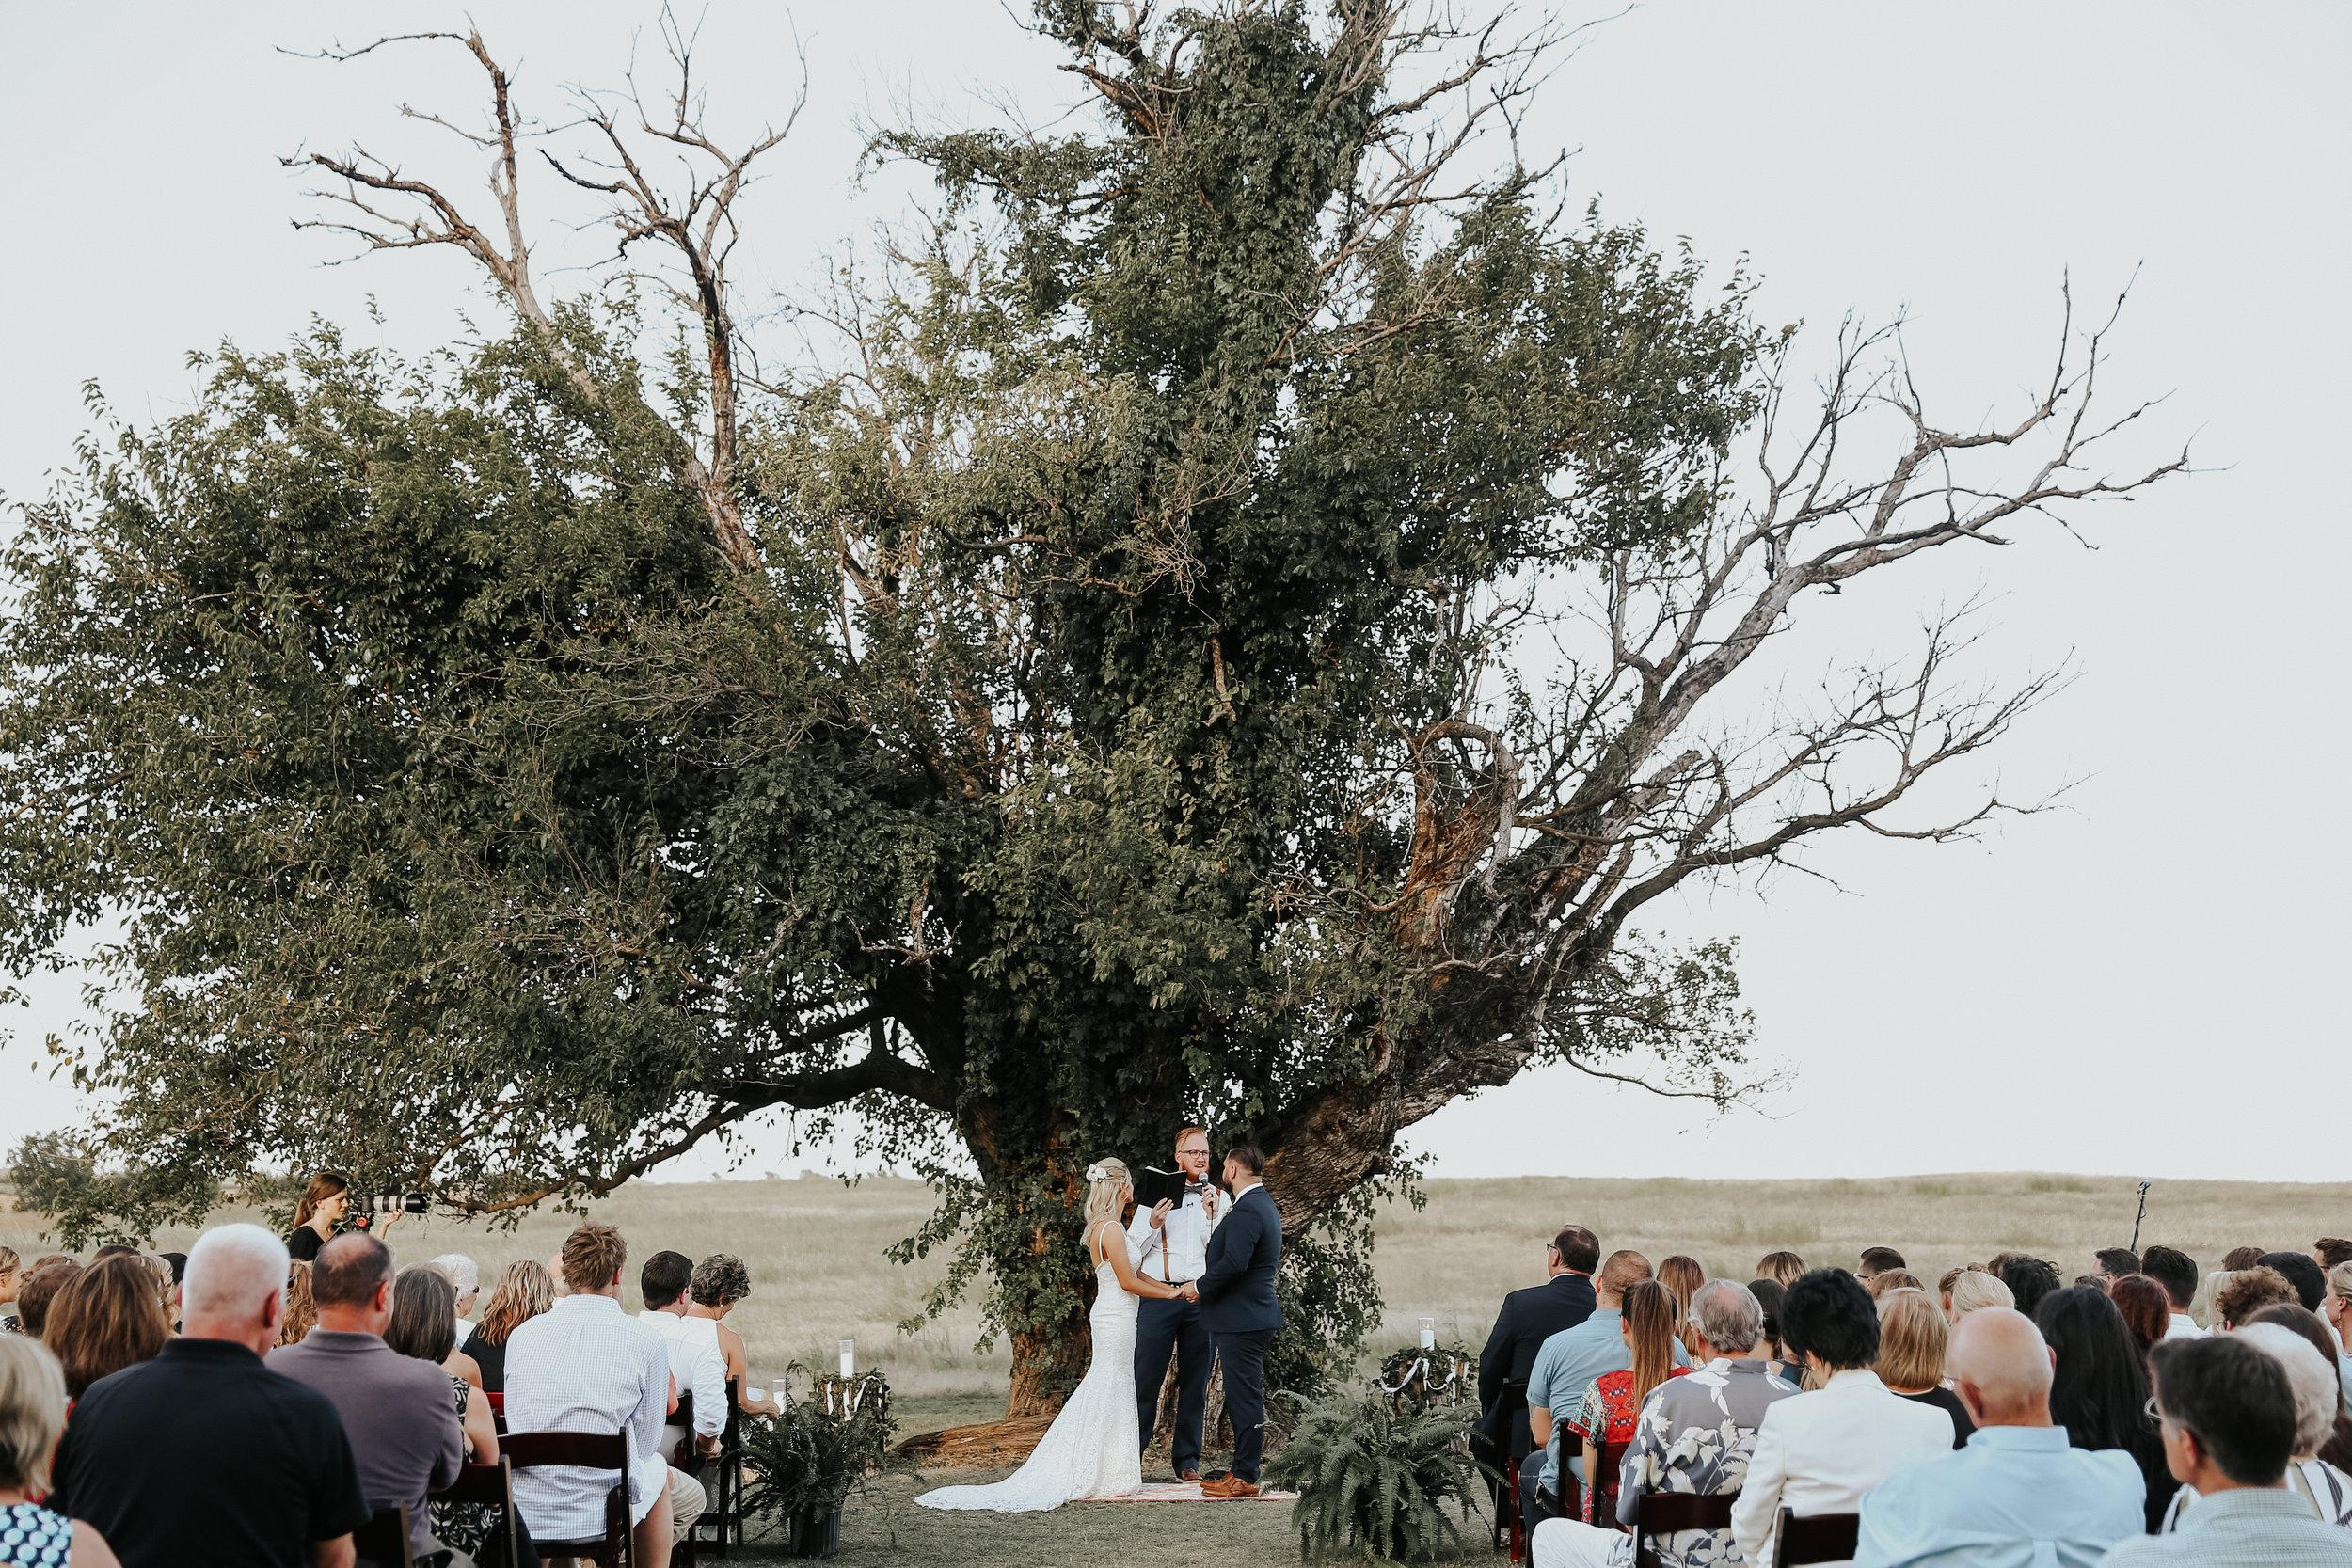 Backyard_Wedding_Oklahoma_MelissaMarshall_21.jpg